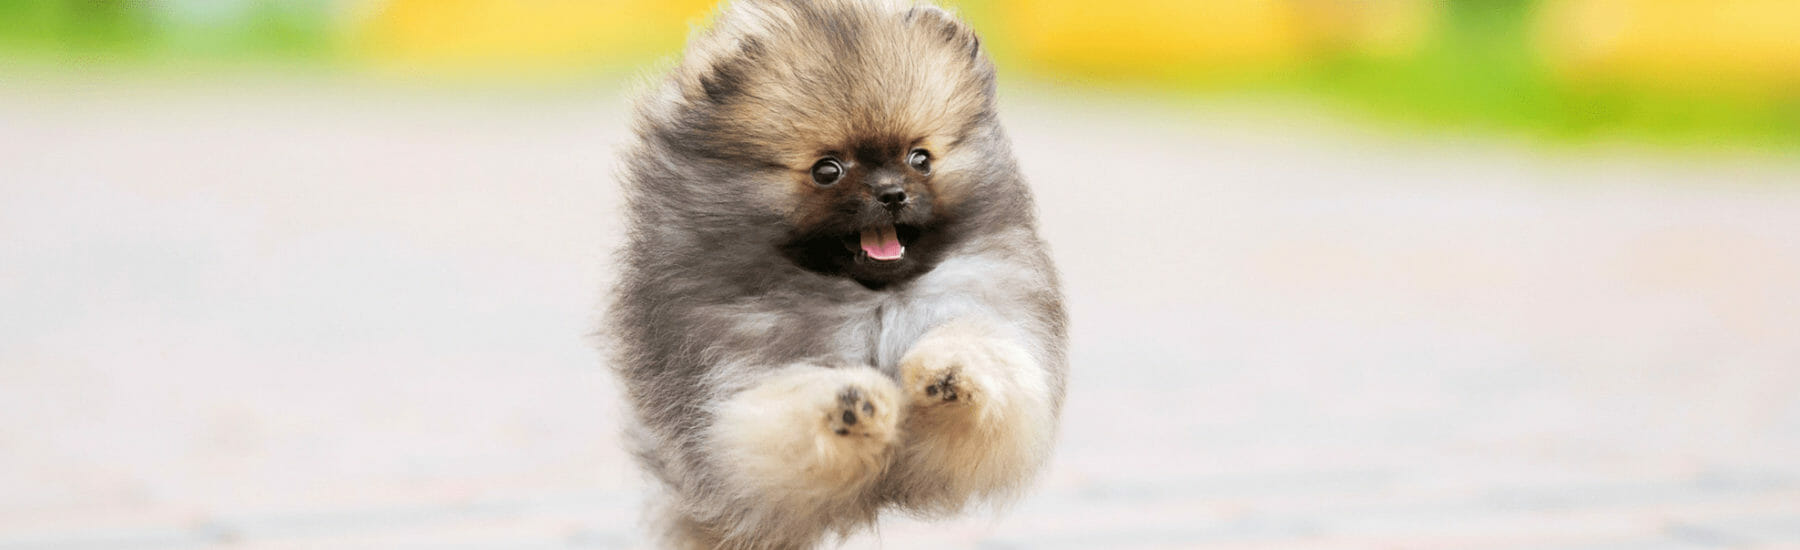 Small puffy dog jumping through the air